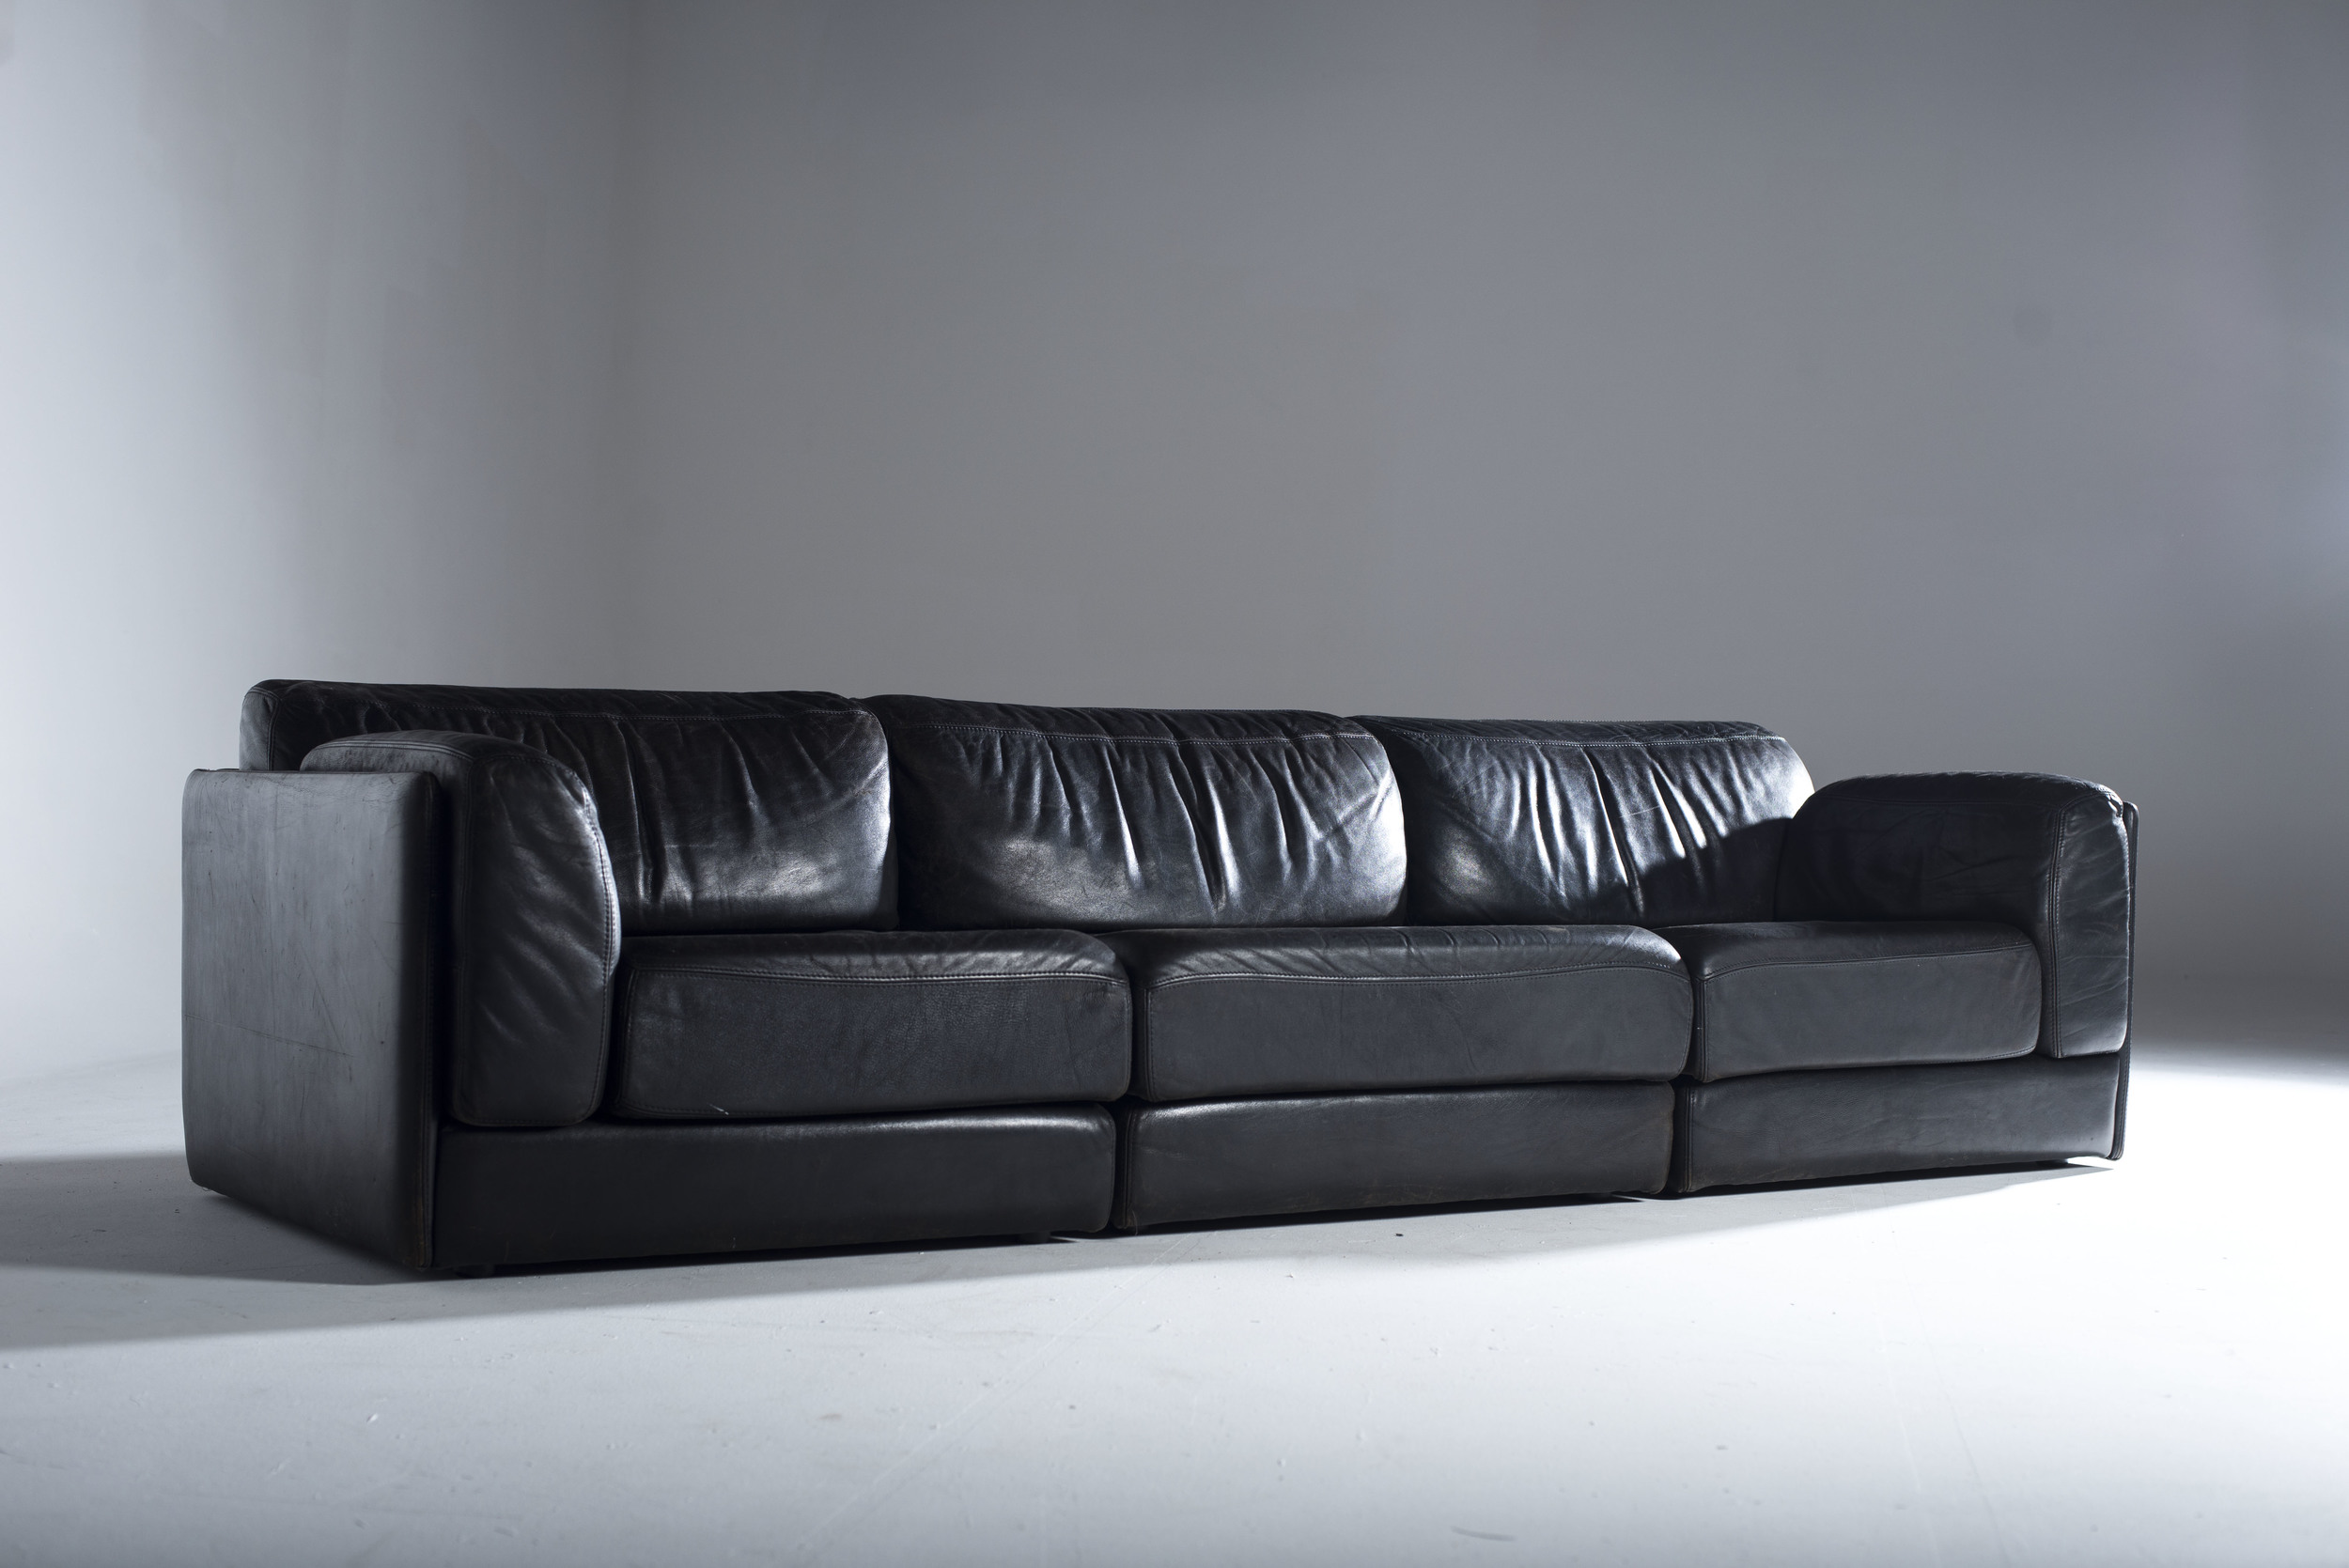 70s sofa chesterfield immediate delivery modular scottlorenzo com jpg